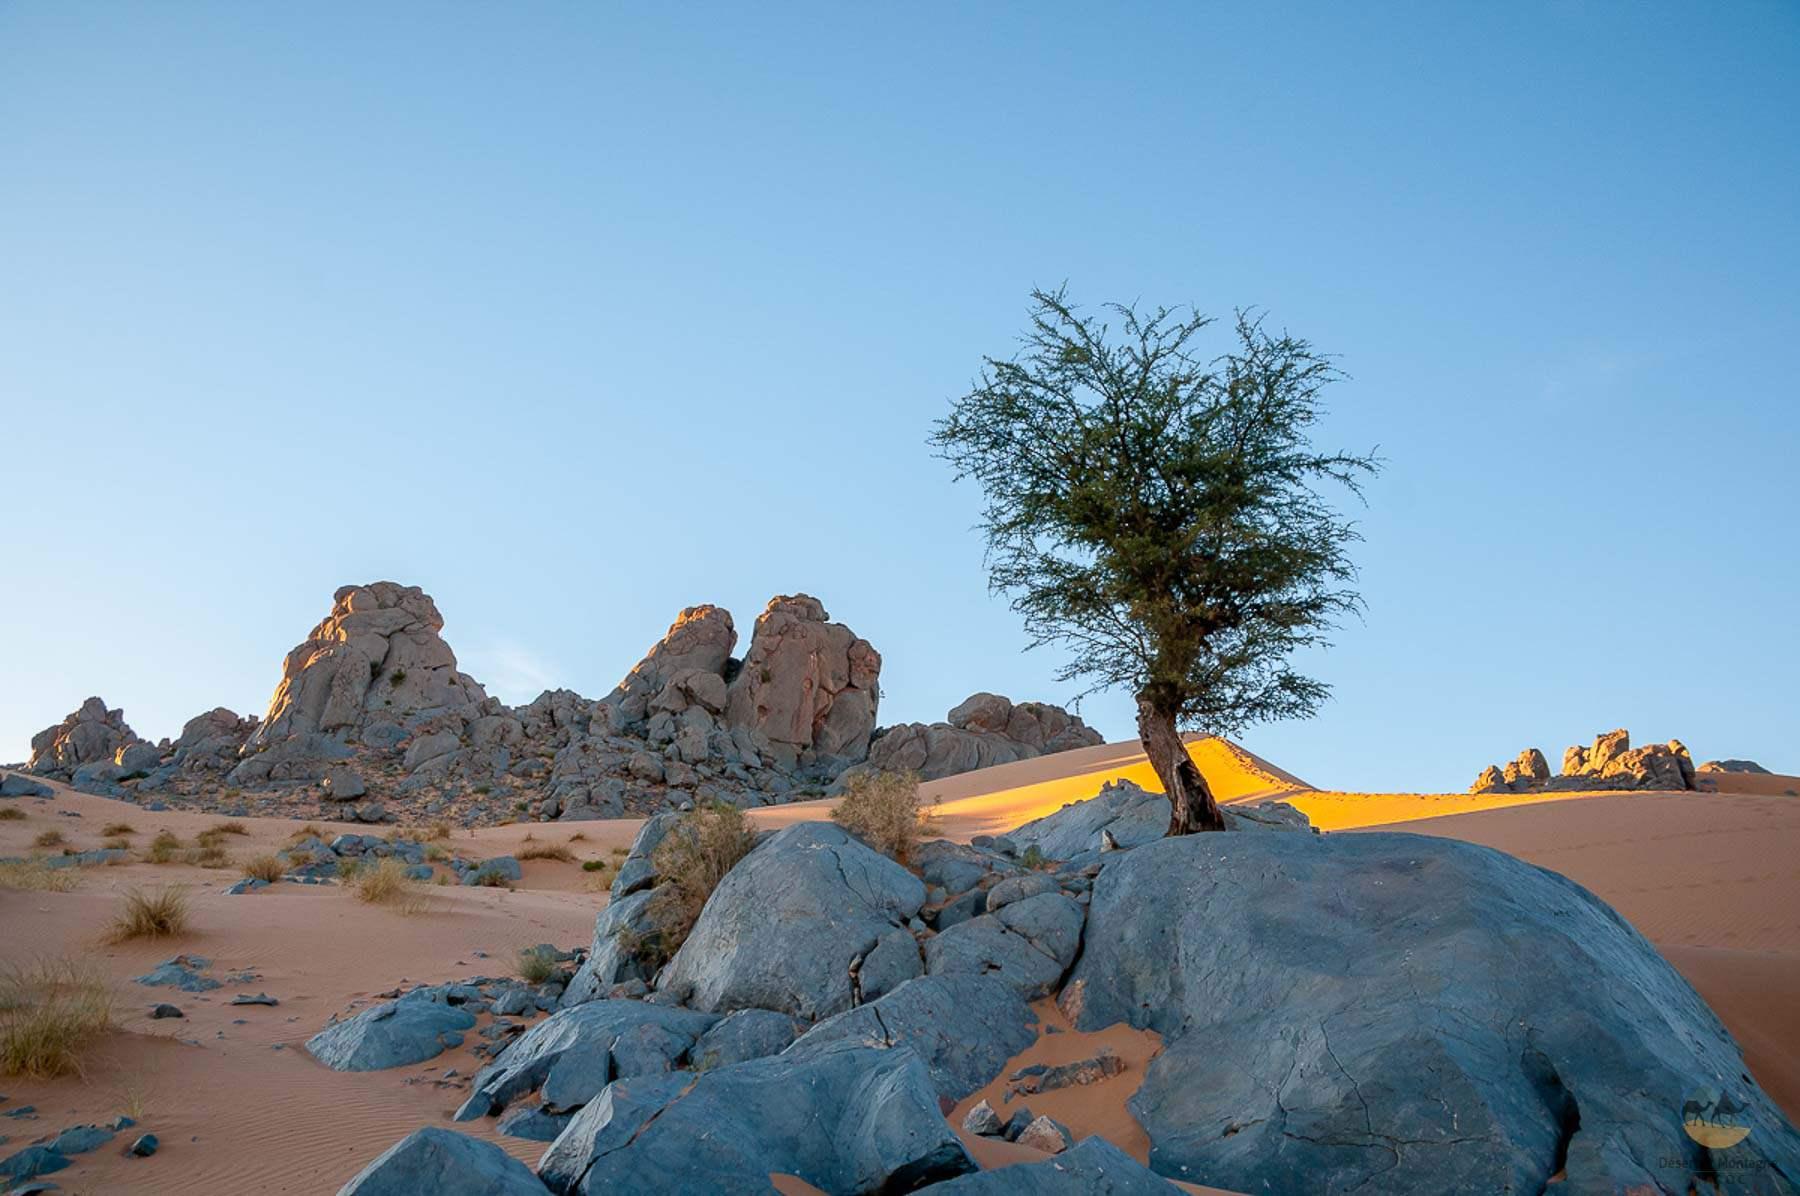 Désert Isk, Maroc